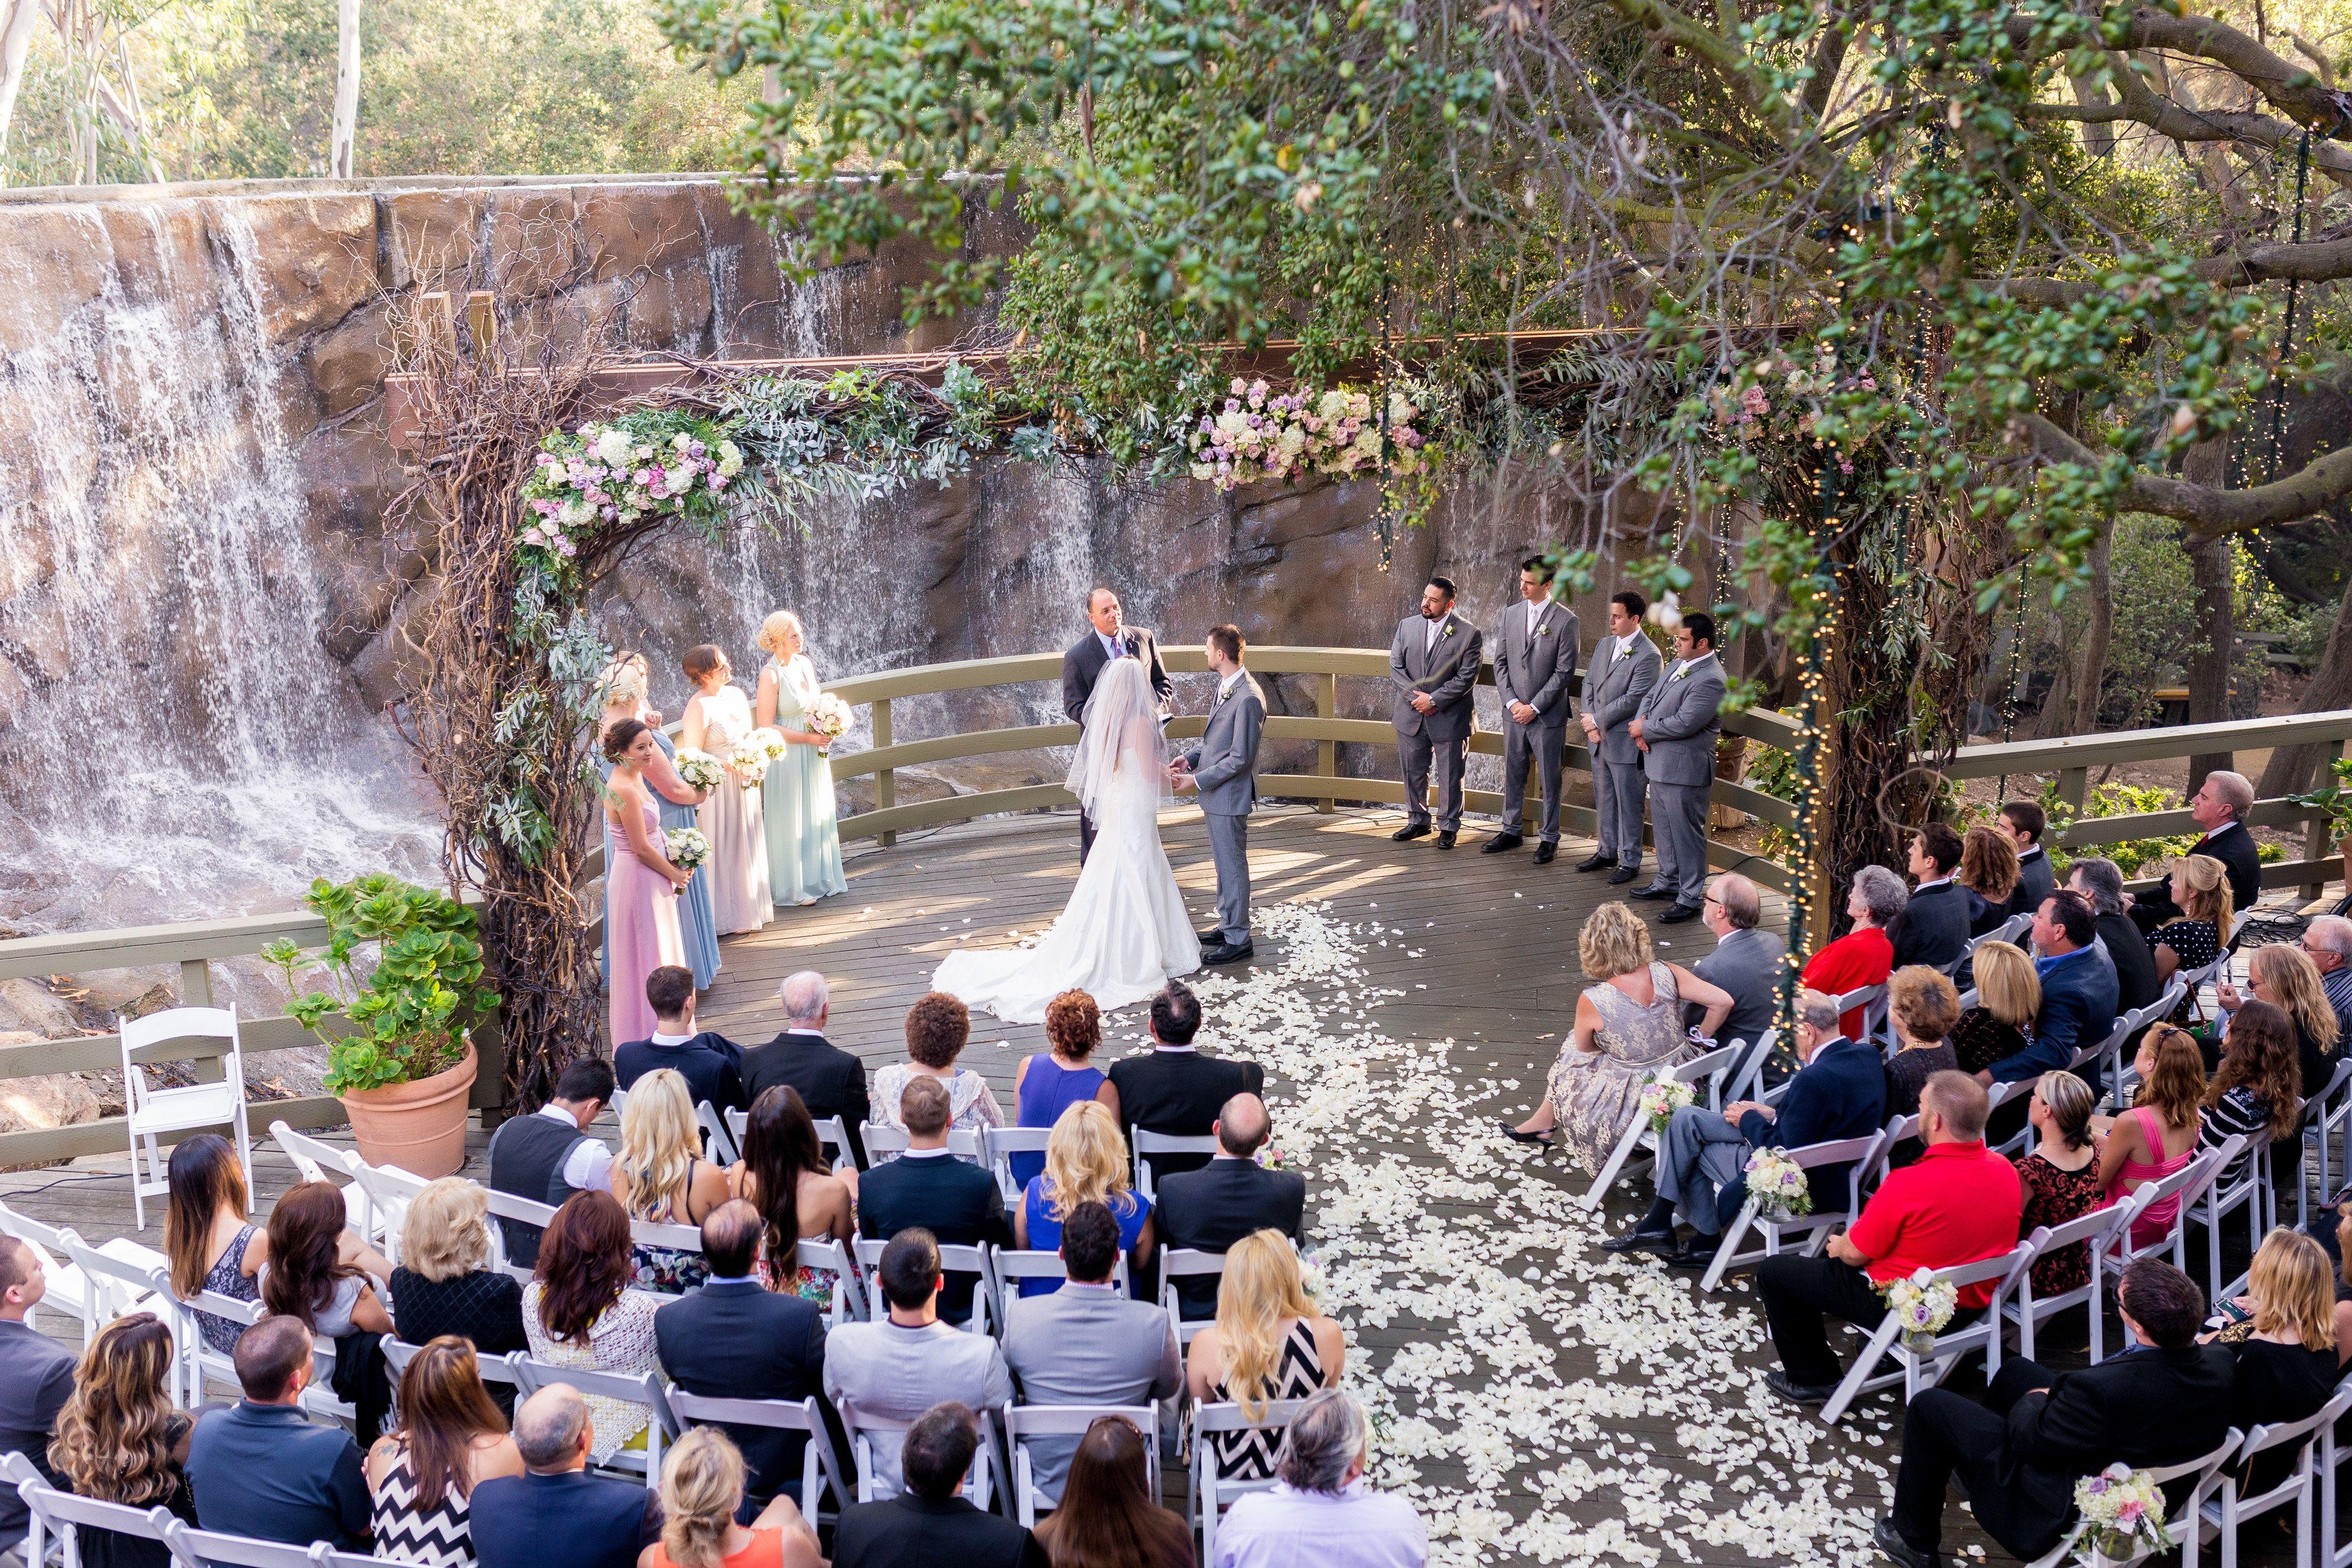 The Oak Room Wedding At Calamigos Ranch Pc Jaimedavisphoto Malibu Wedding Malibu Wedding Venues Calamigos Ranch Wedding